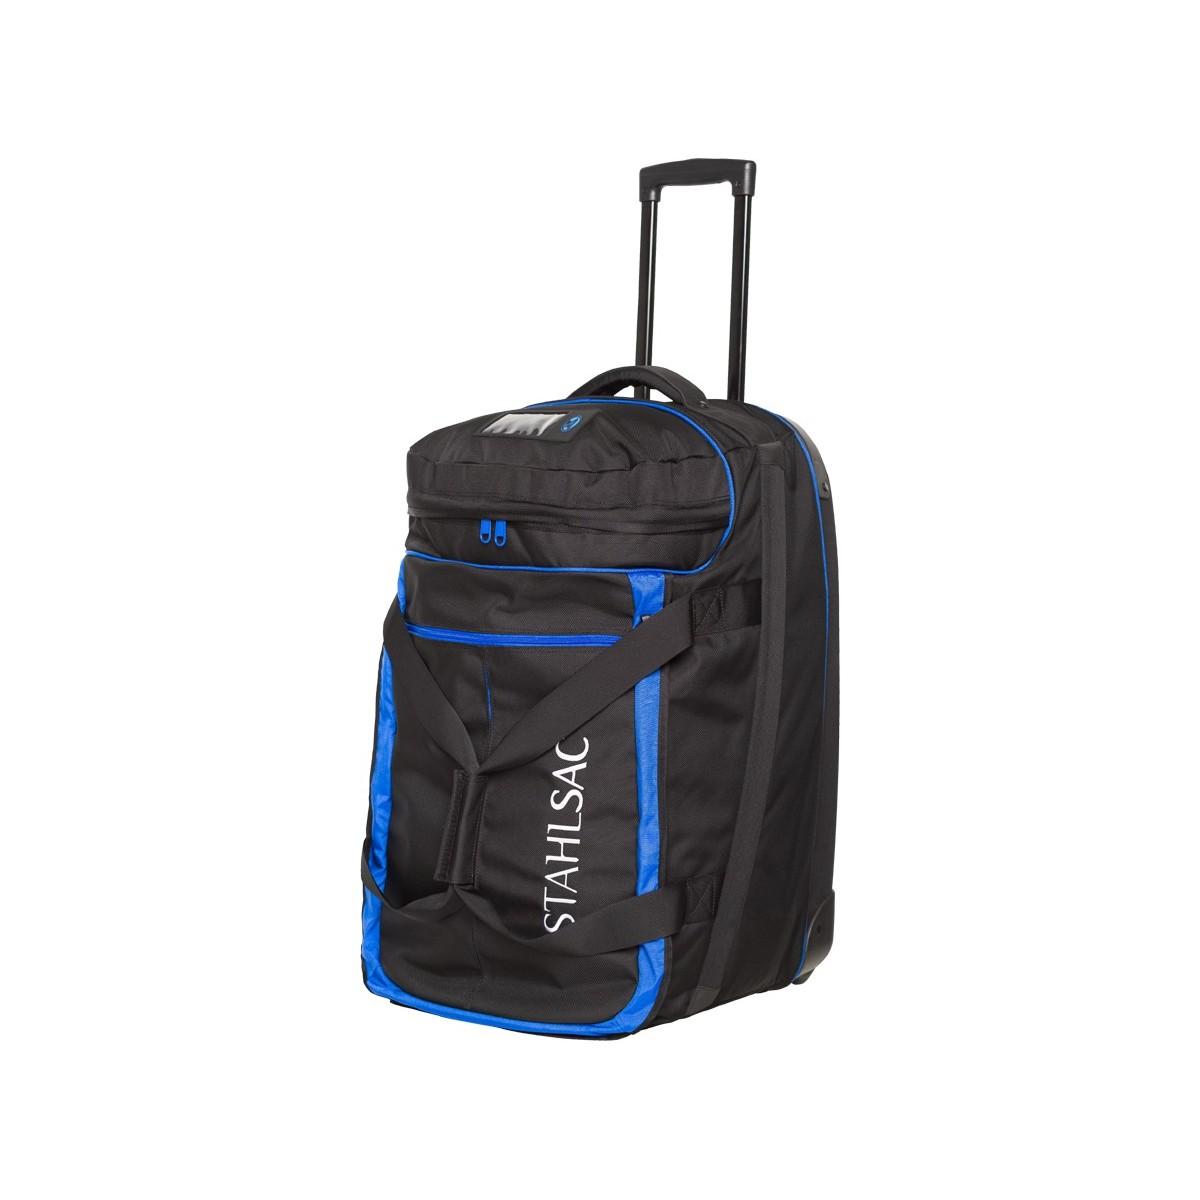 Stahlsac Jamaican Smuggler Travel Bag